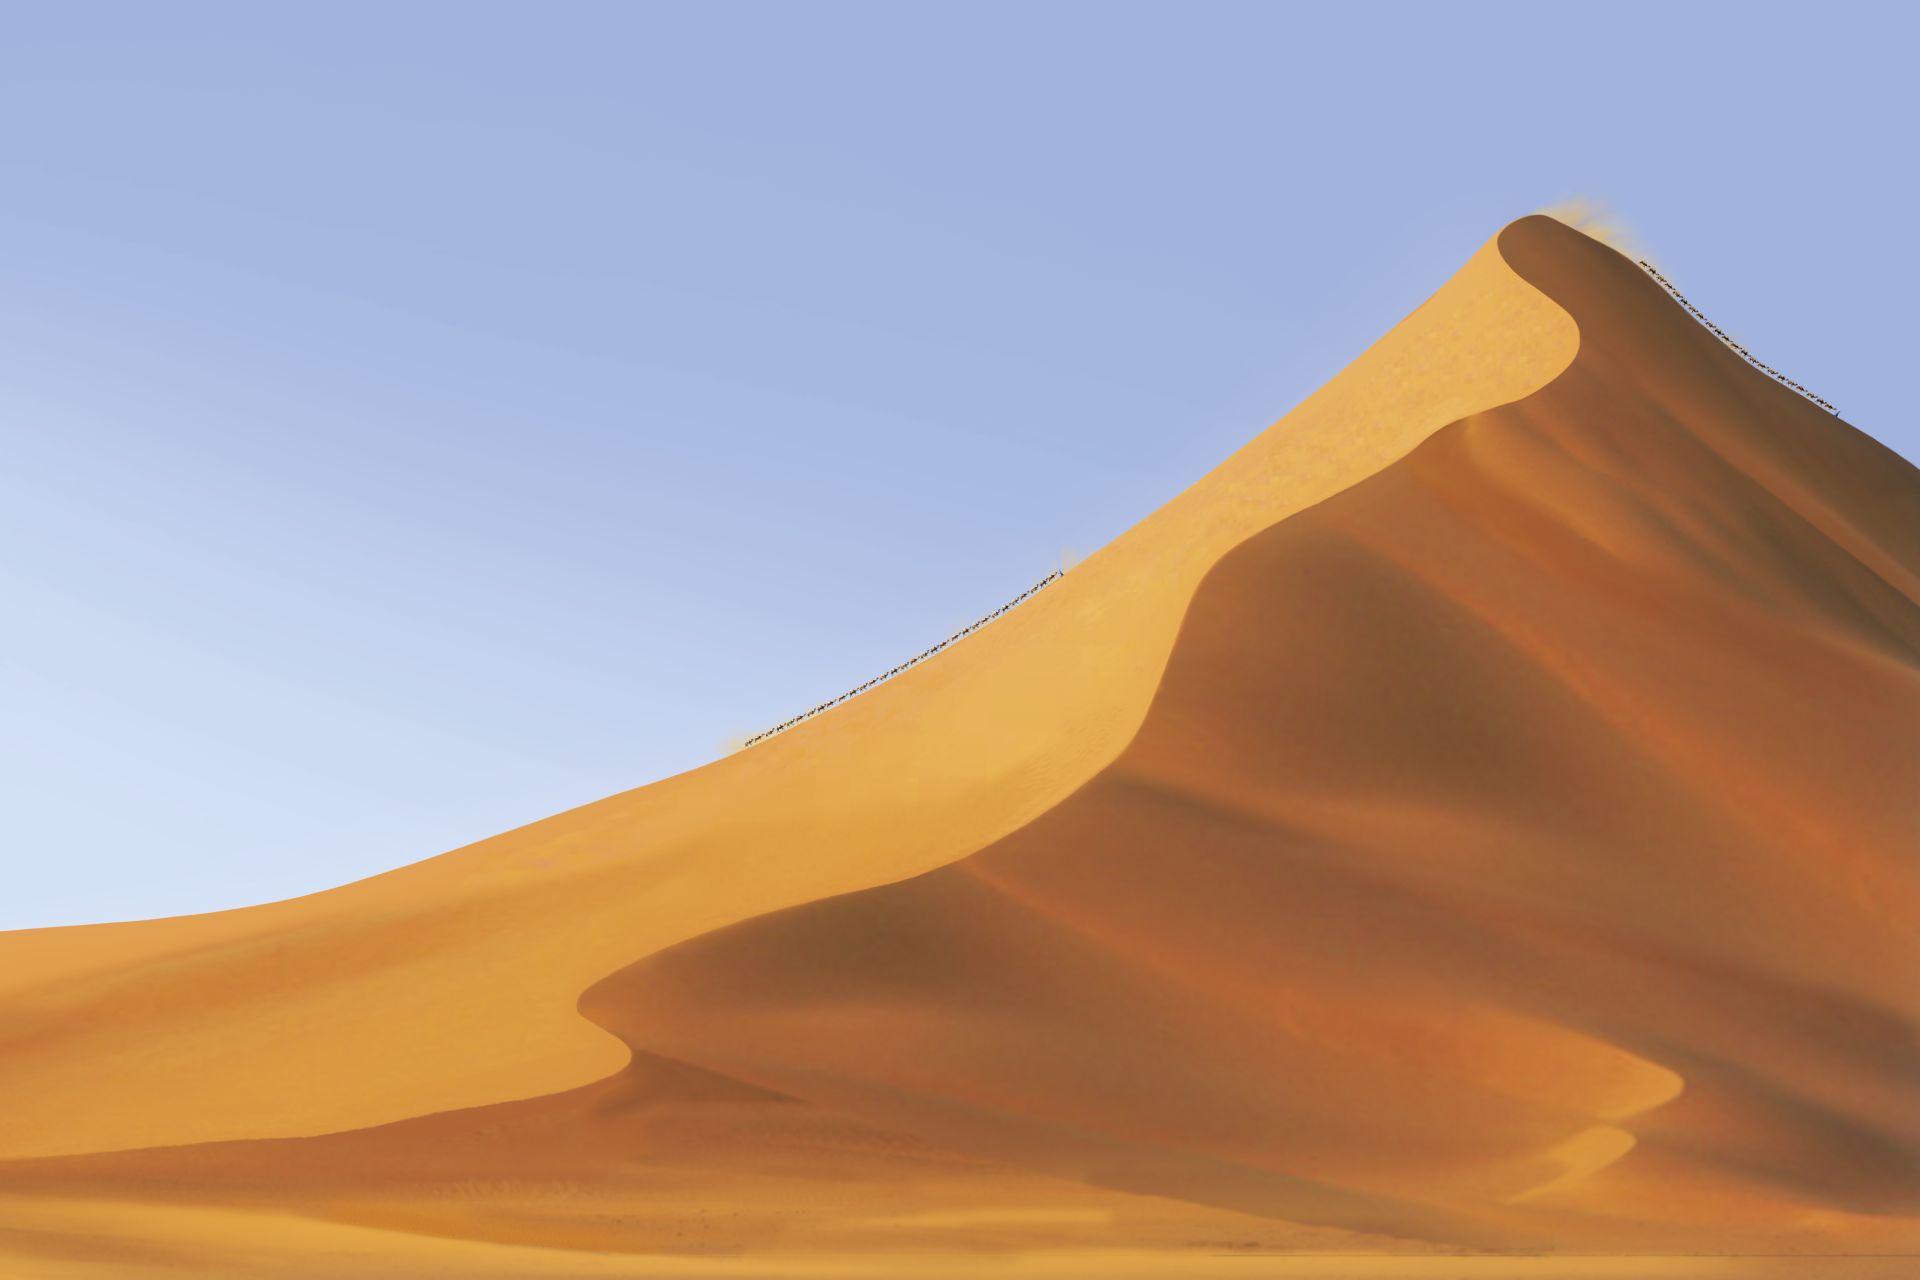 Sahara clipart sand dune #1